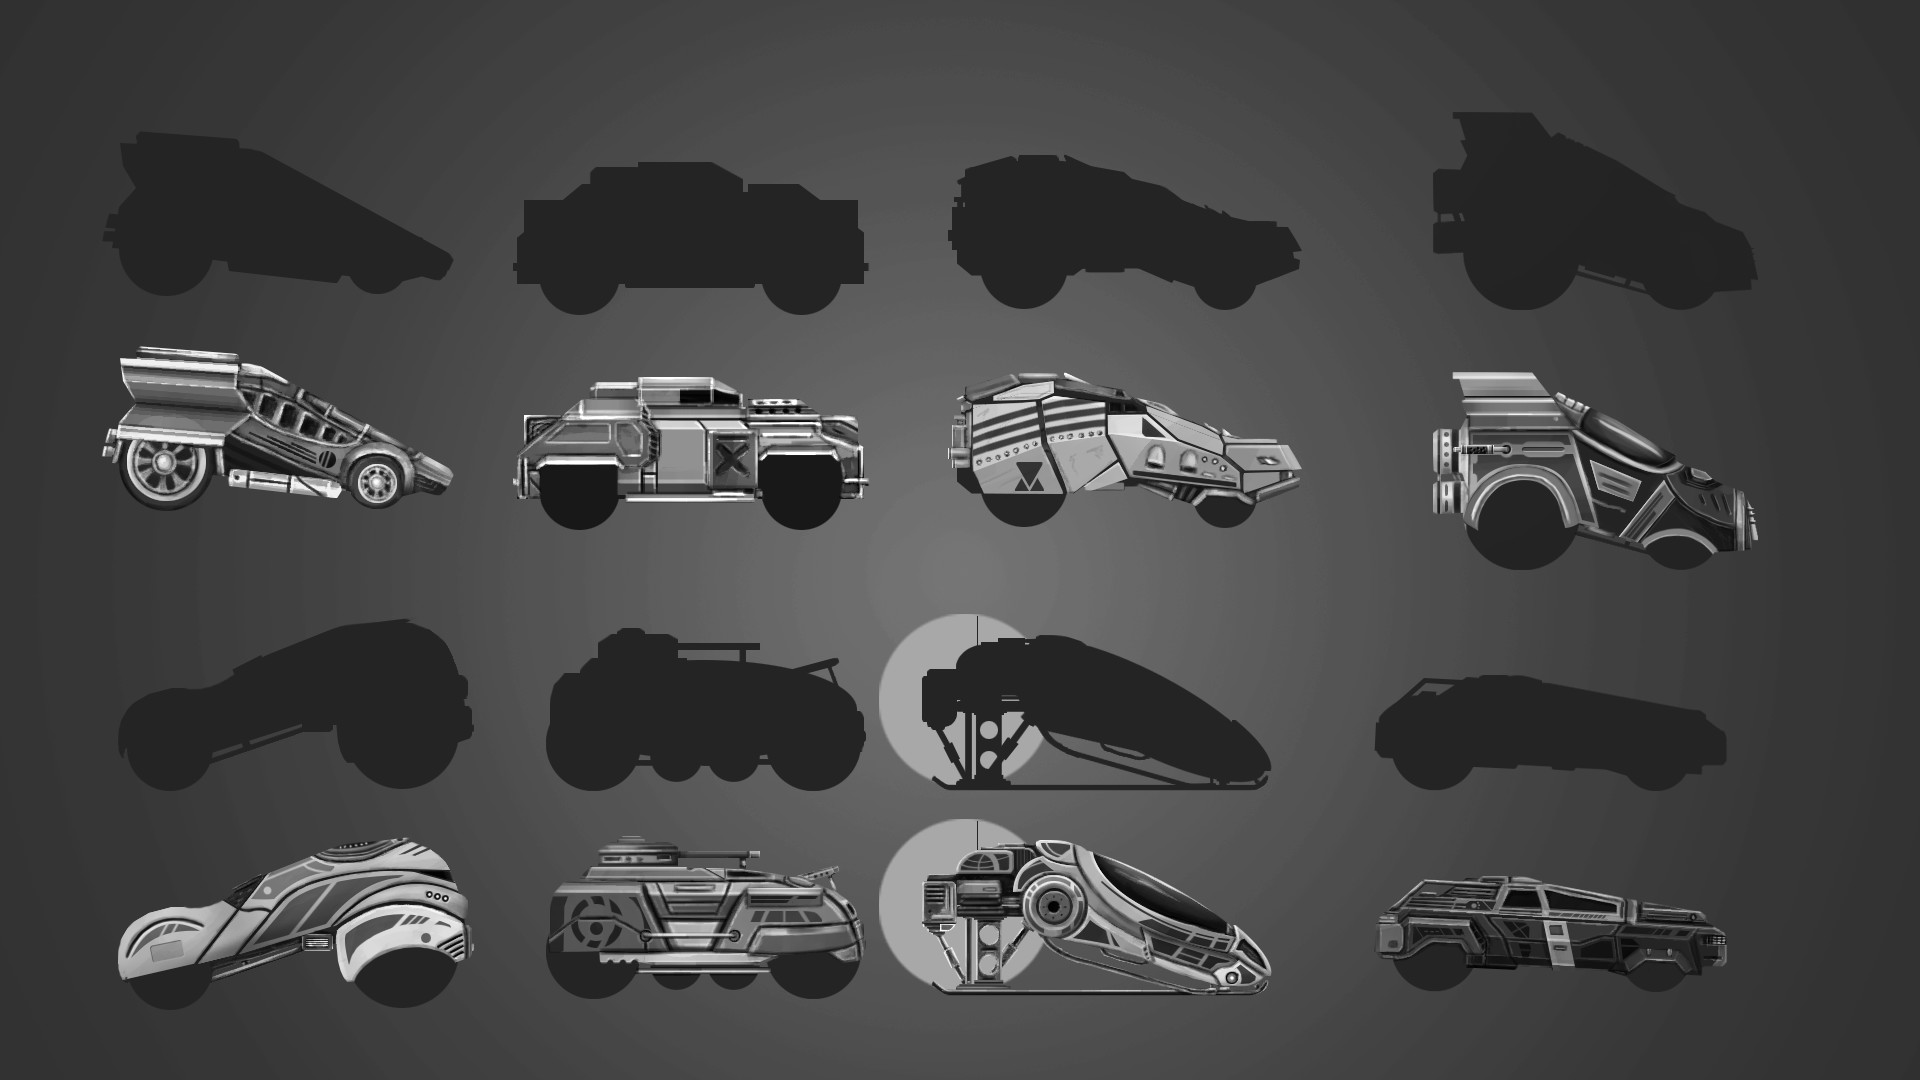 Roman Rebatov - Concept of 2d cars